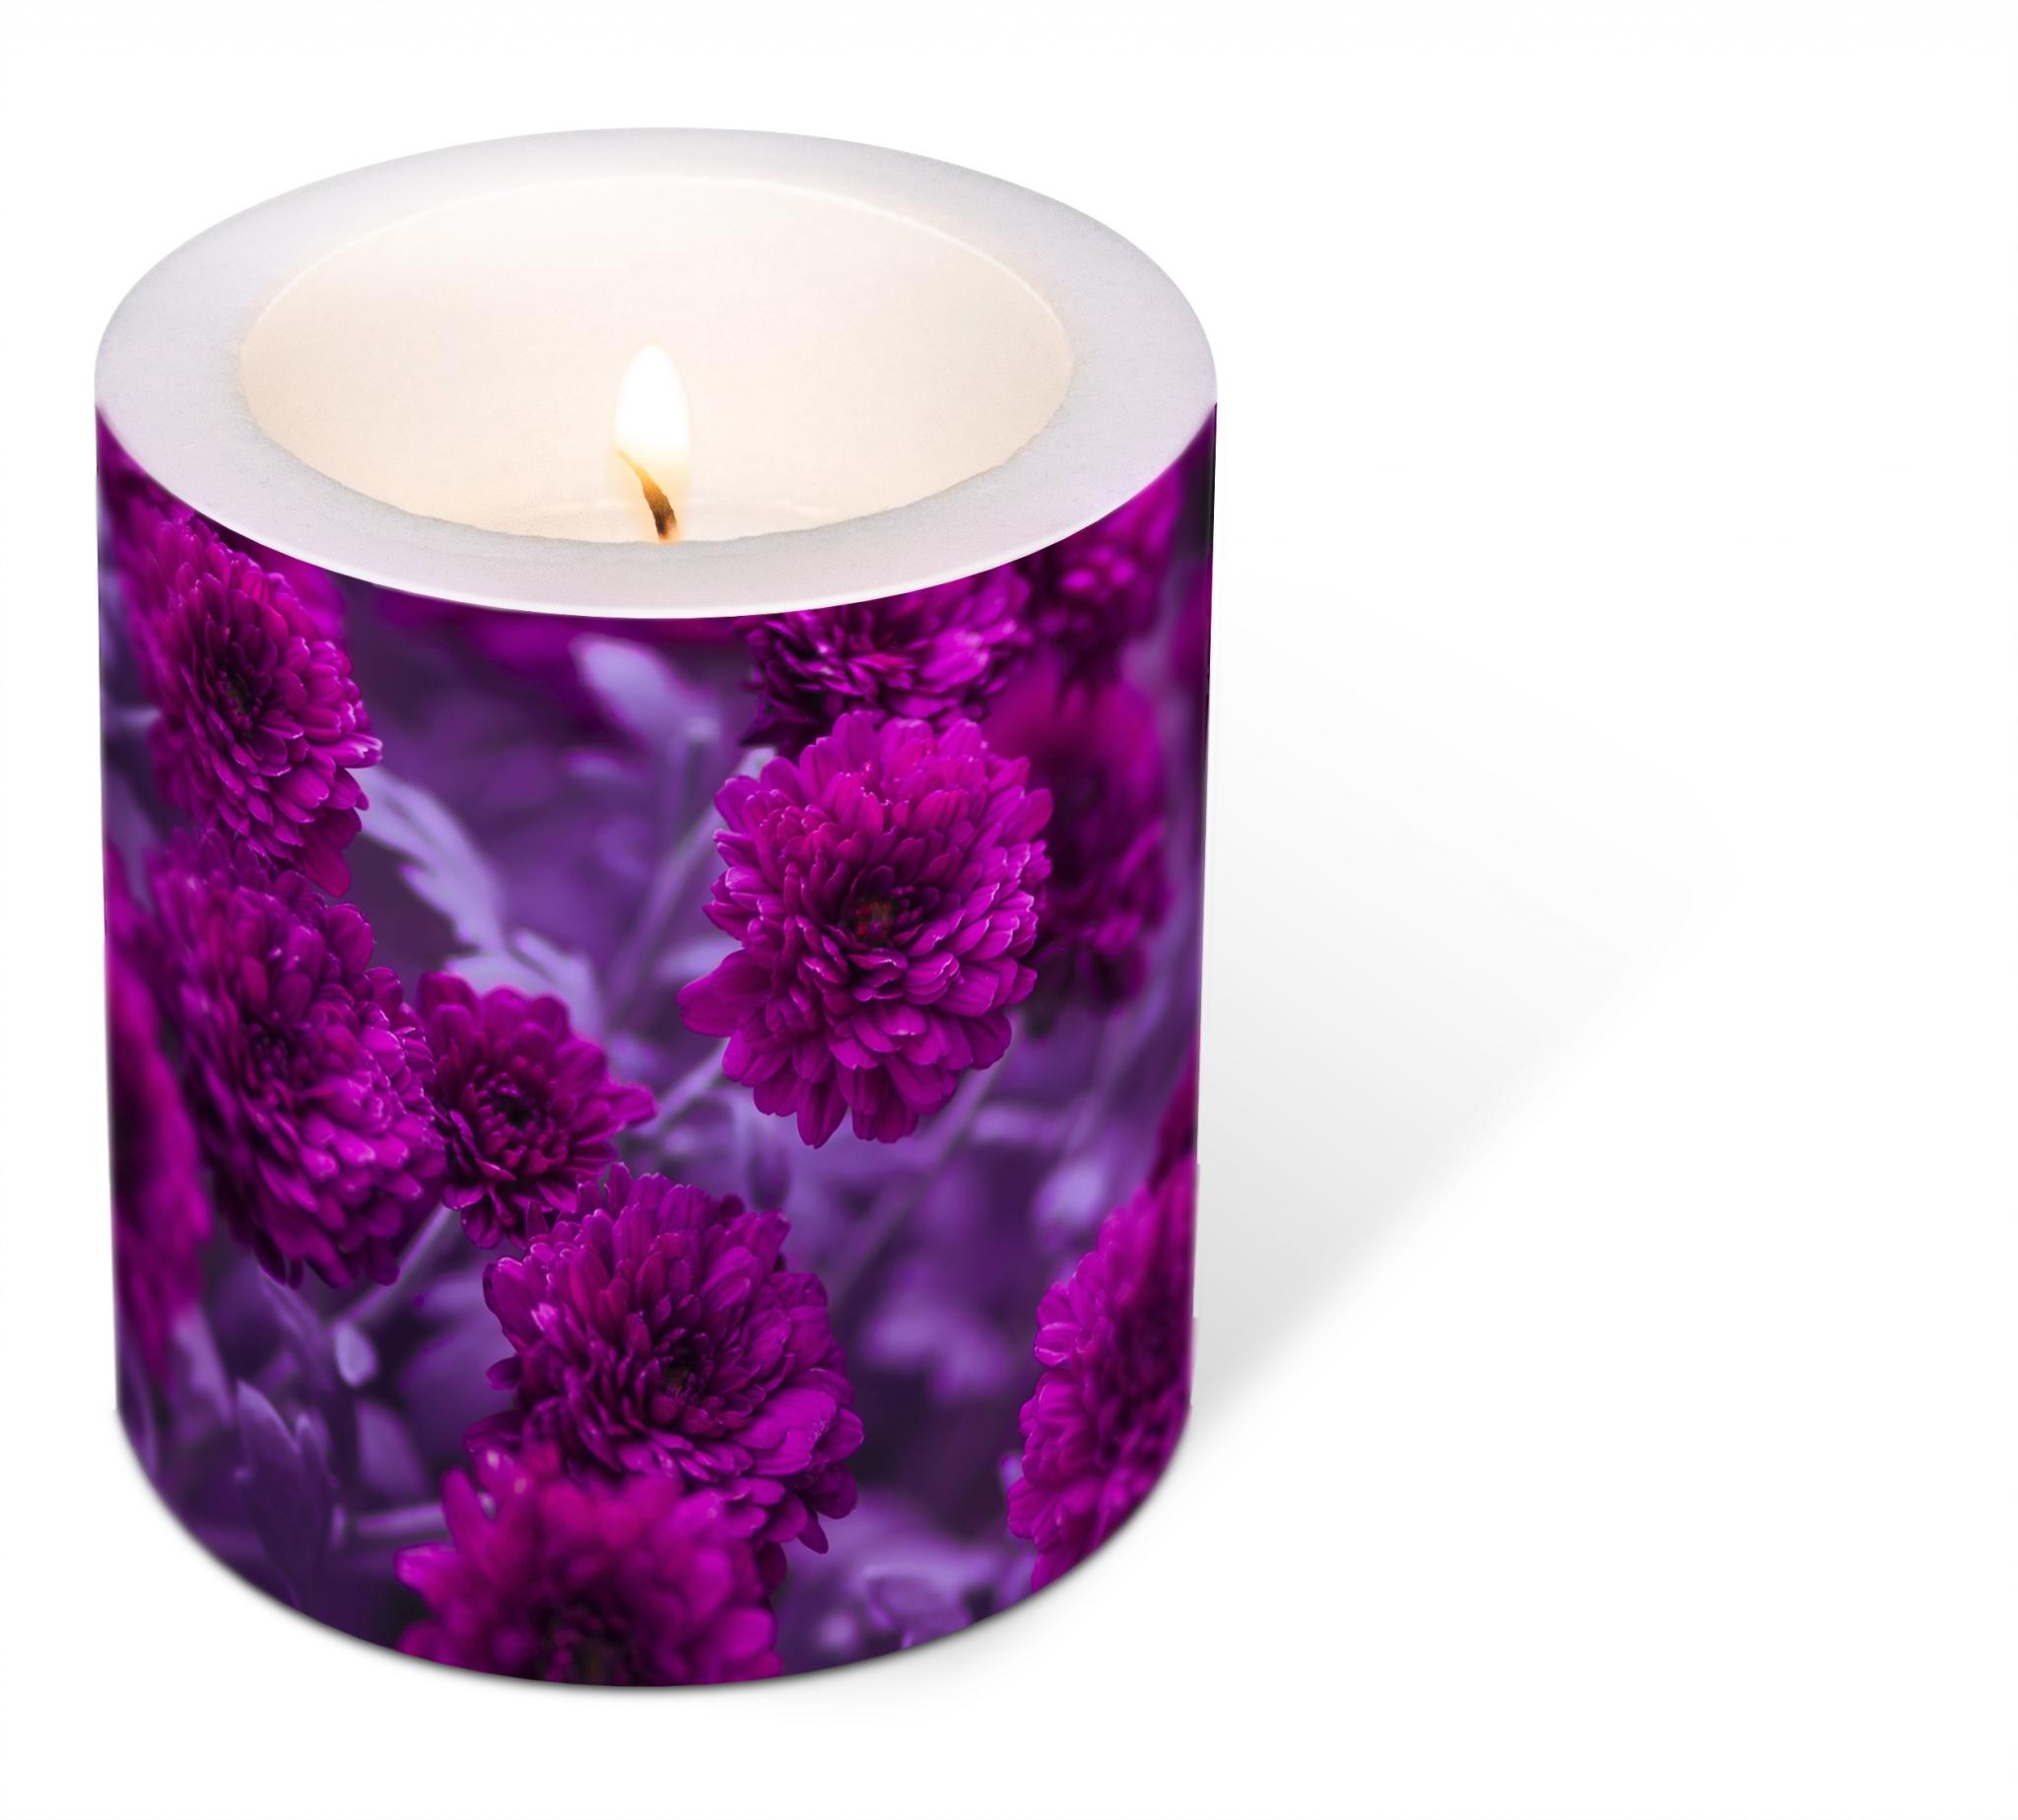 decorative candle - Decorated Fuchsia Flowers